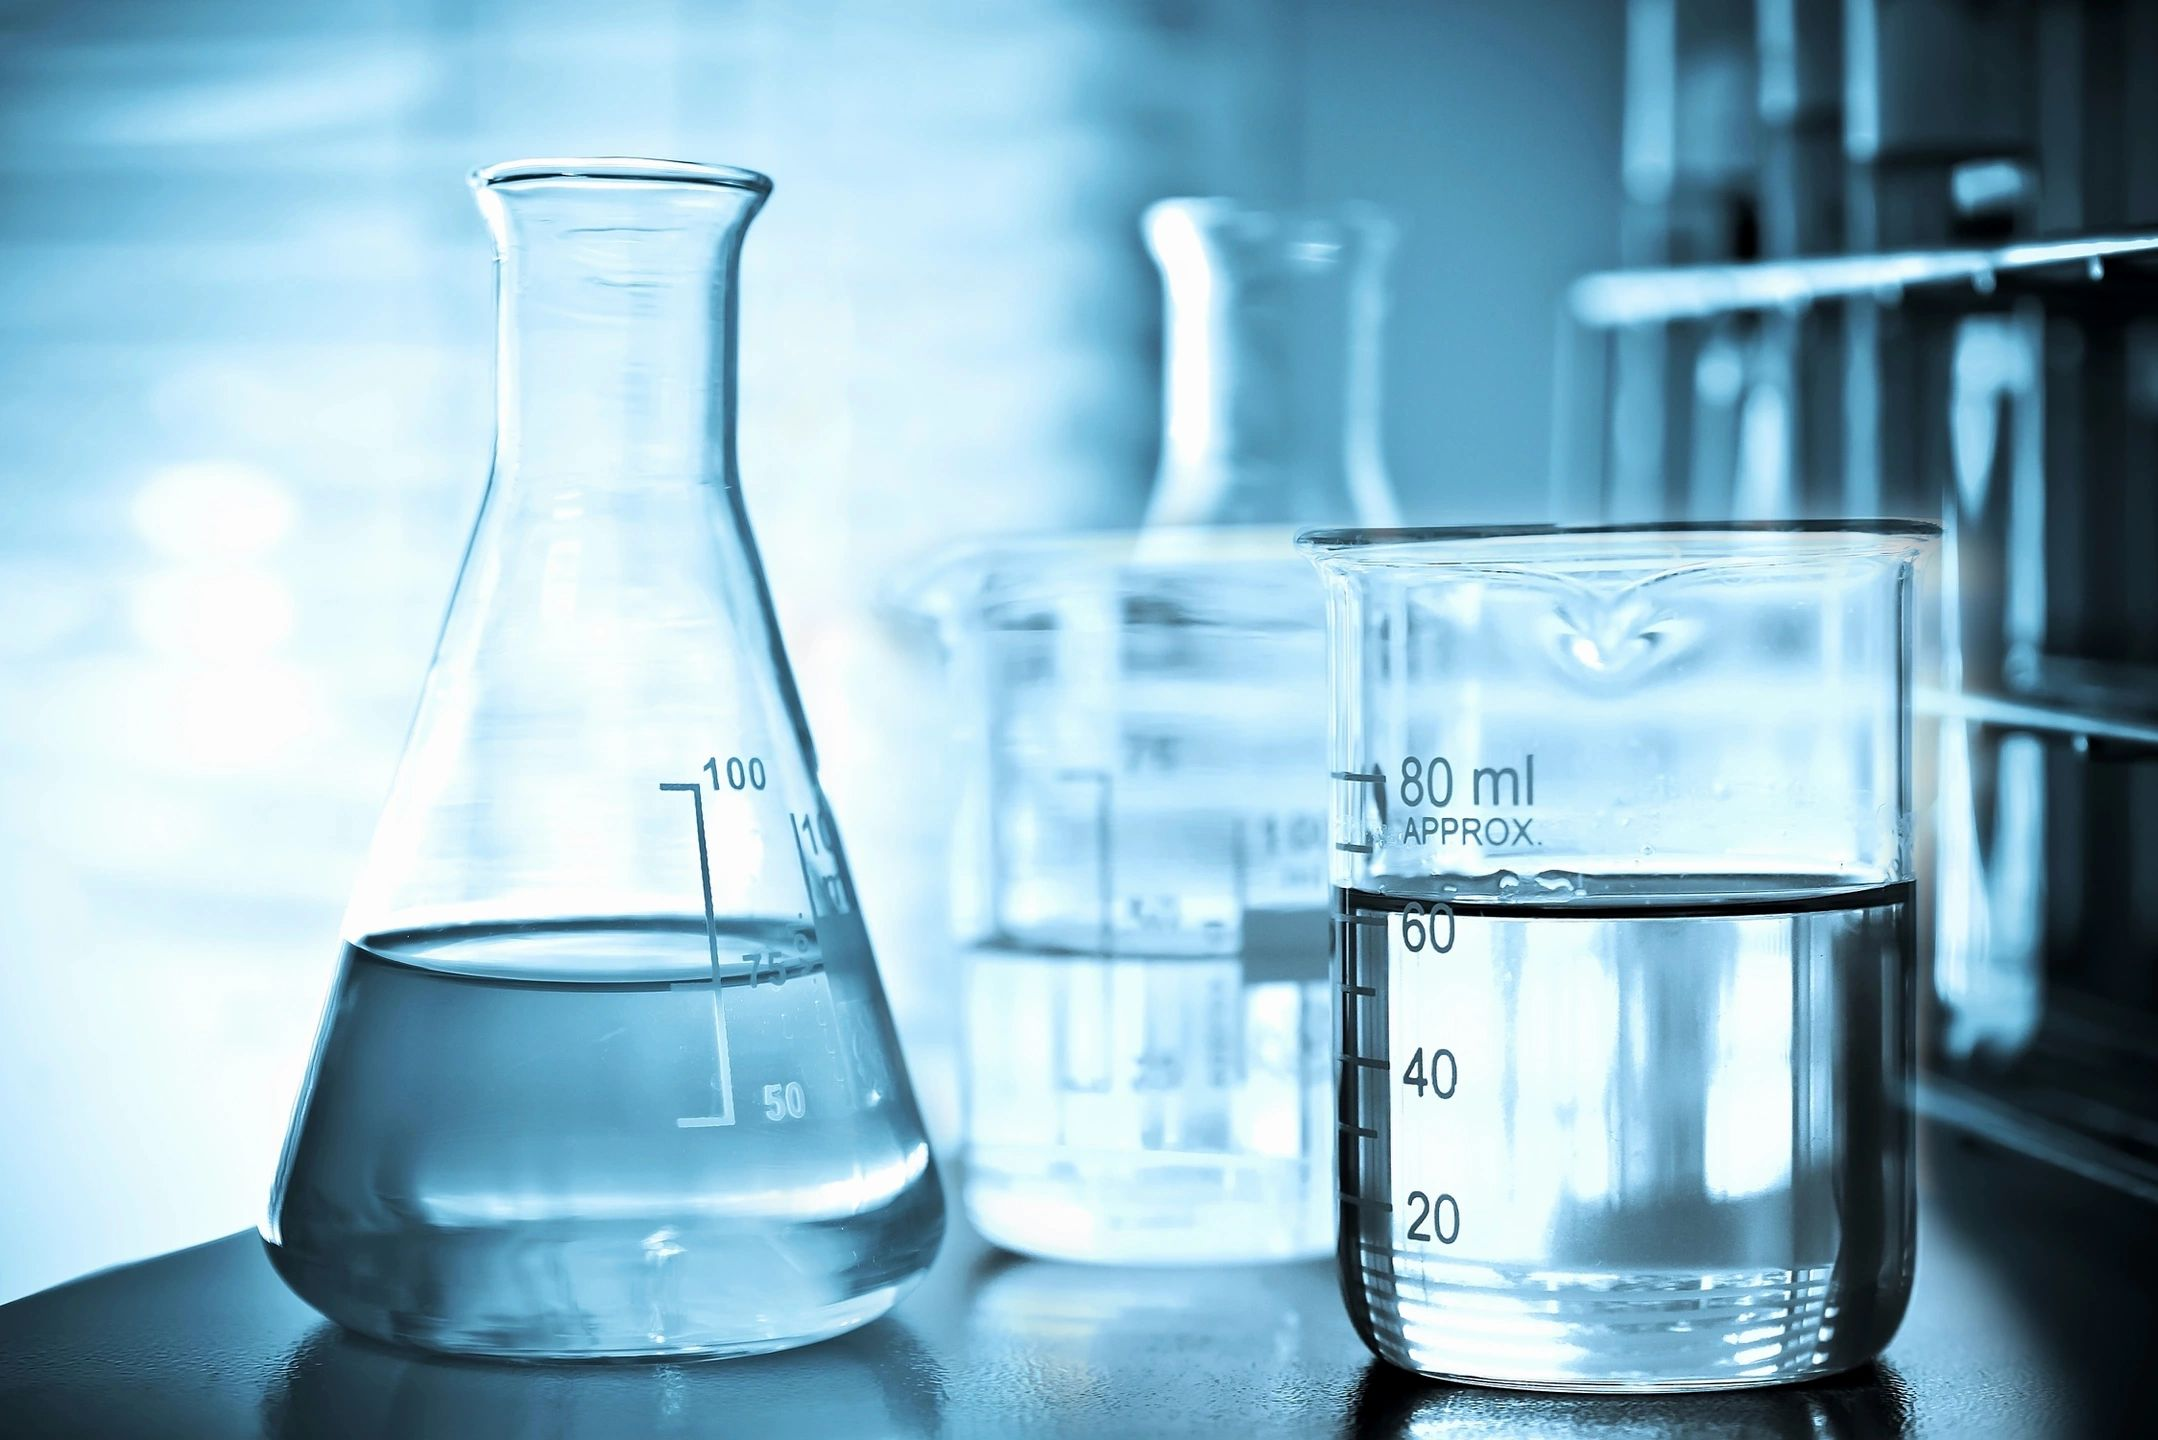 трихлорэтилен физические свойства